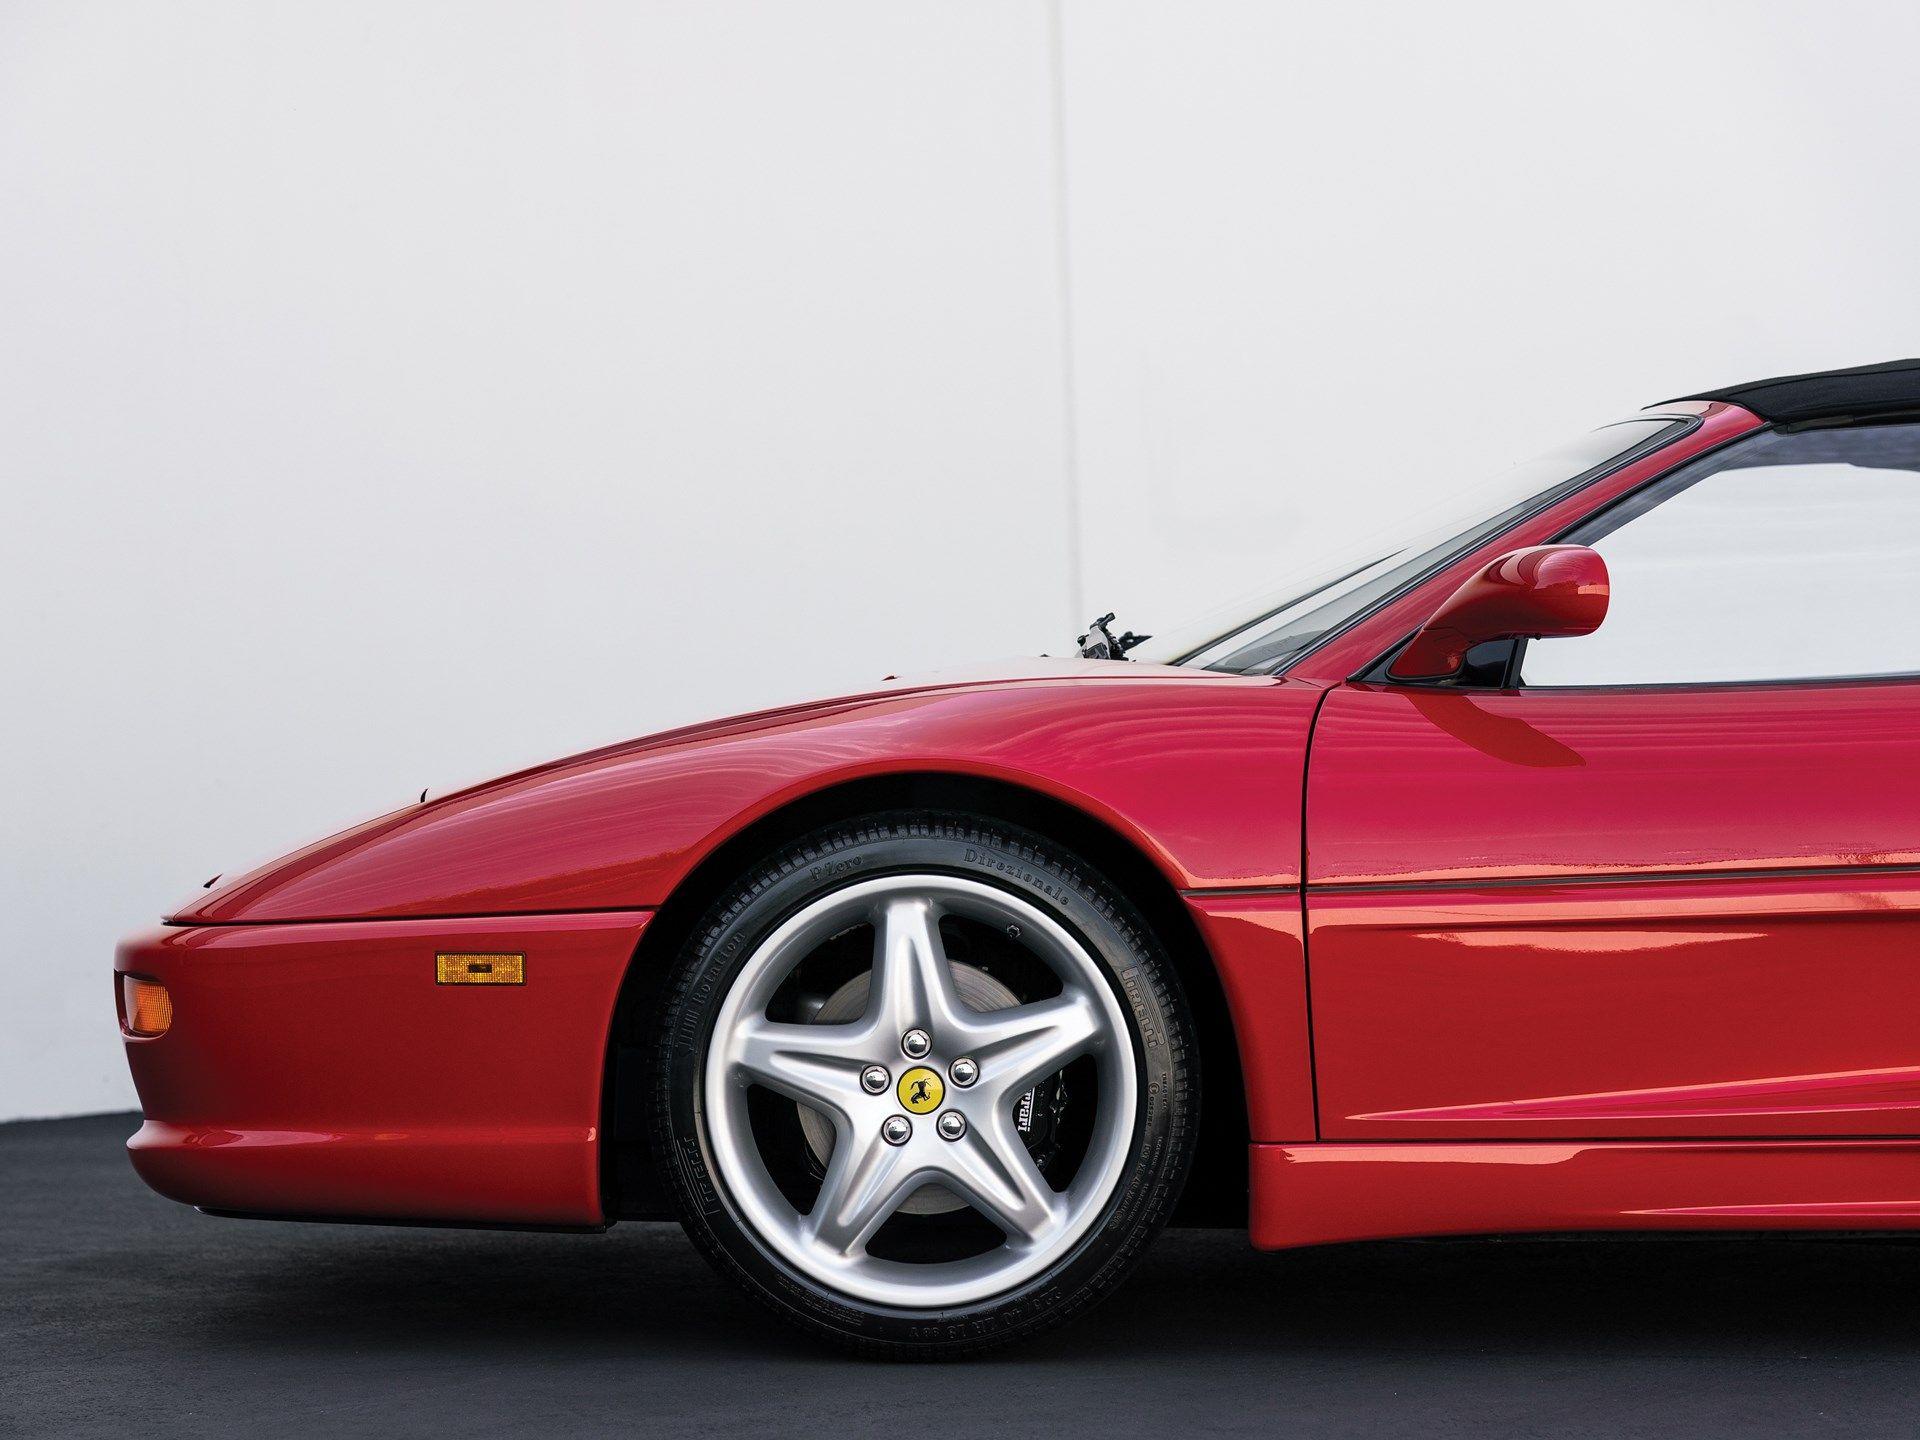 1997 Ferrari F355 Spider Ferrari Bmw Car